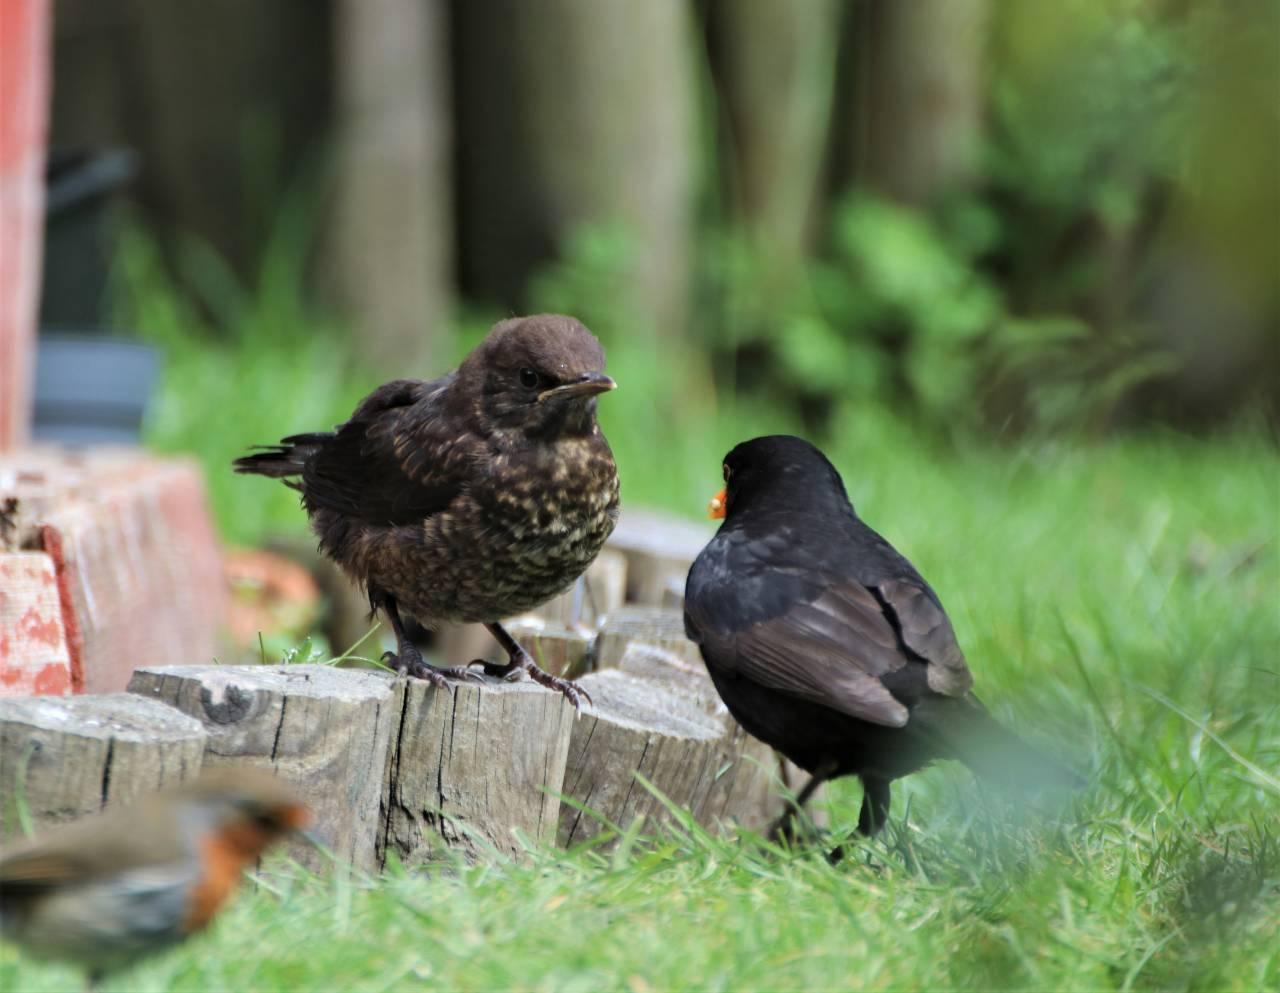 Blackbird feeding her young